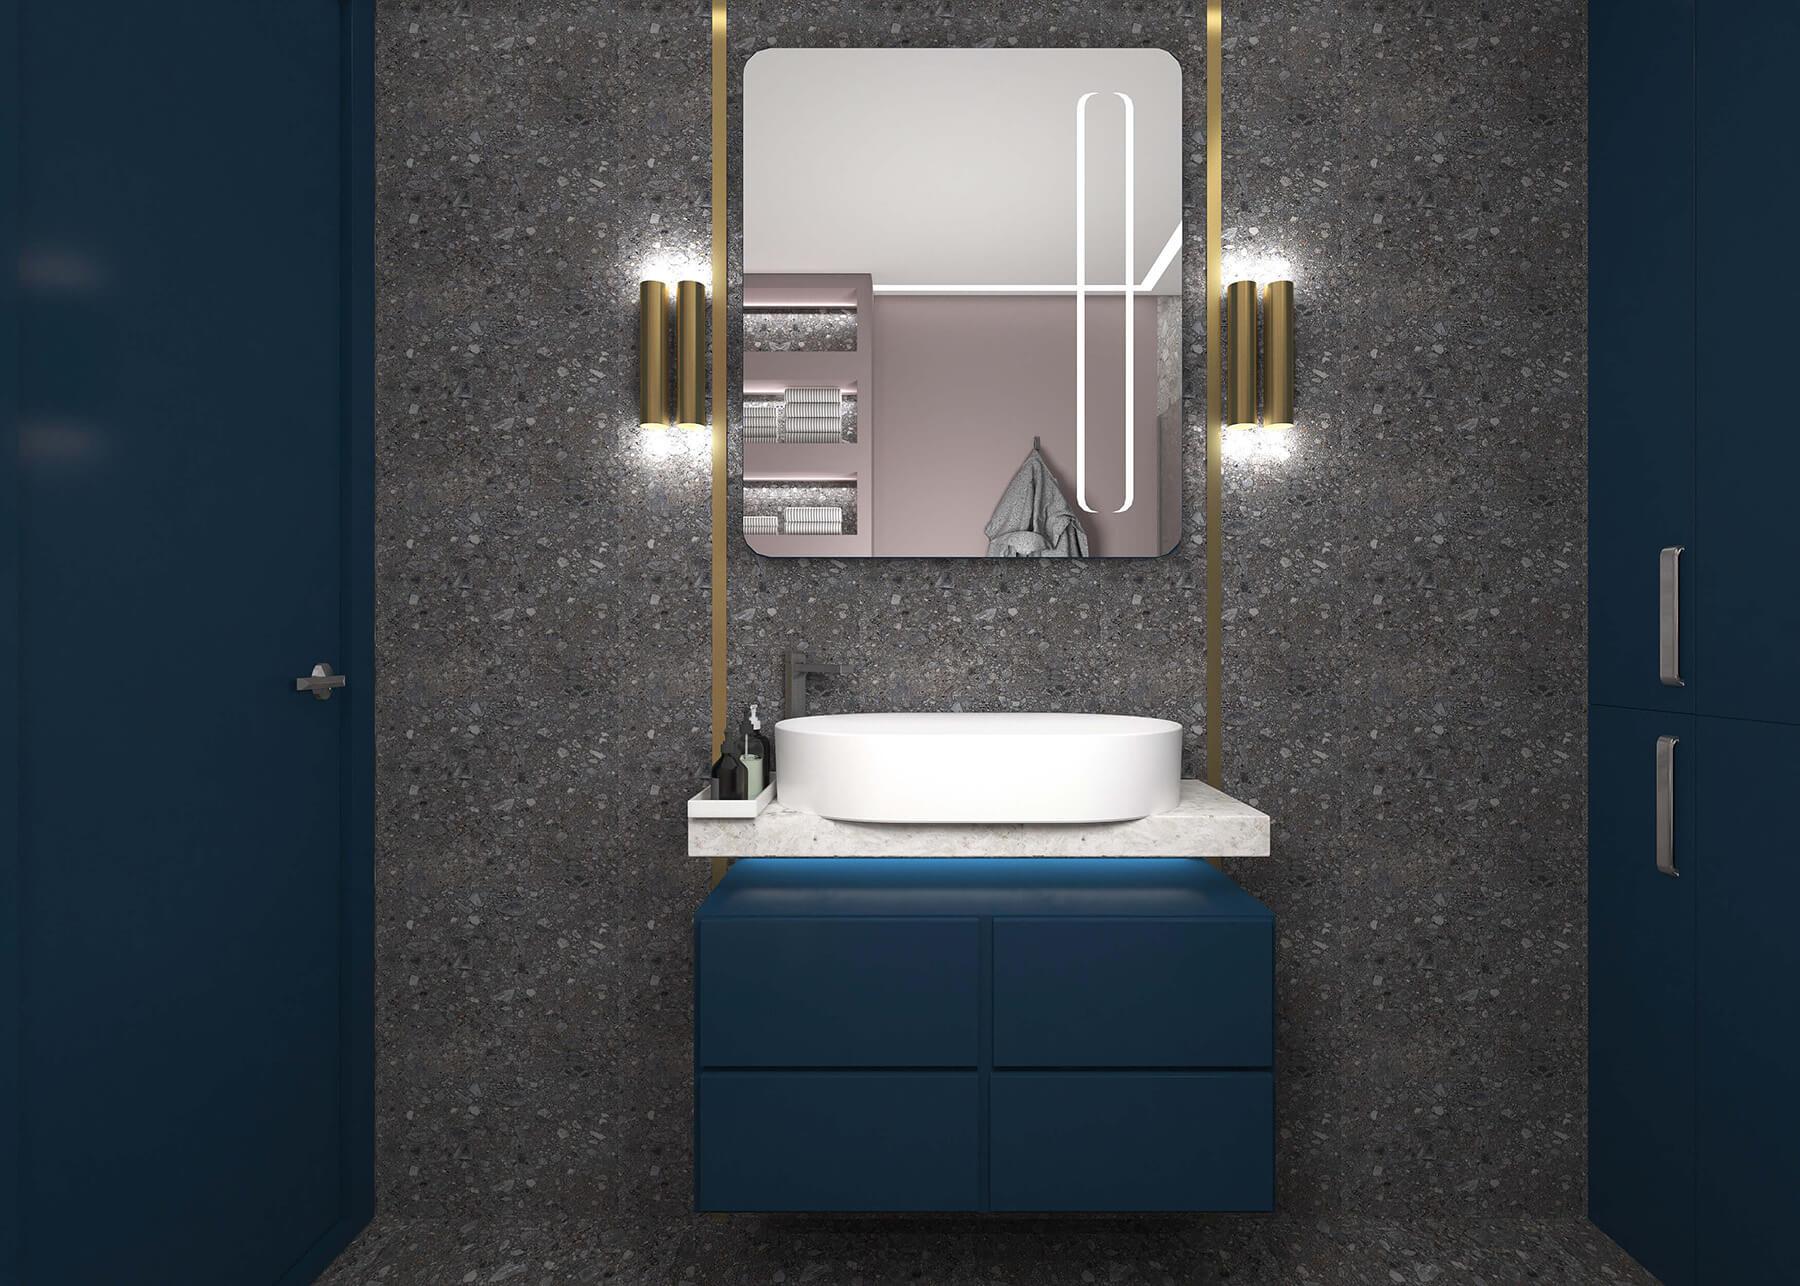 Navy_blue_and_grey_bathroom_design_Urvission_Interiors